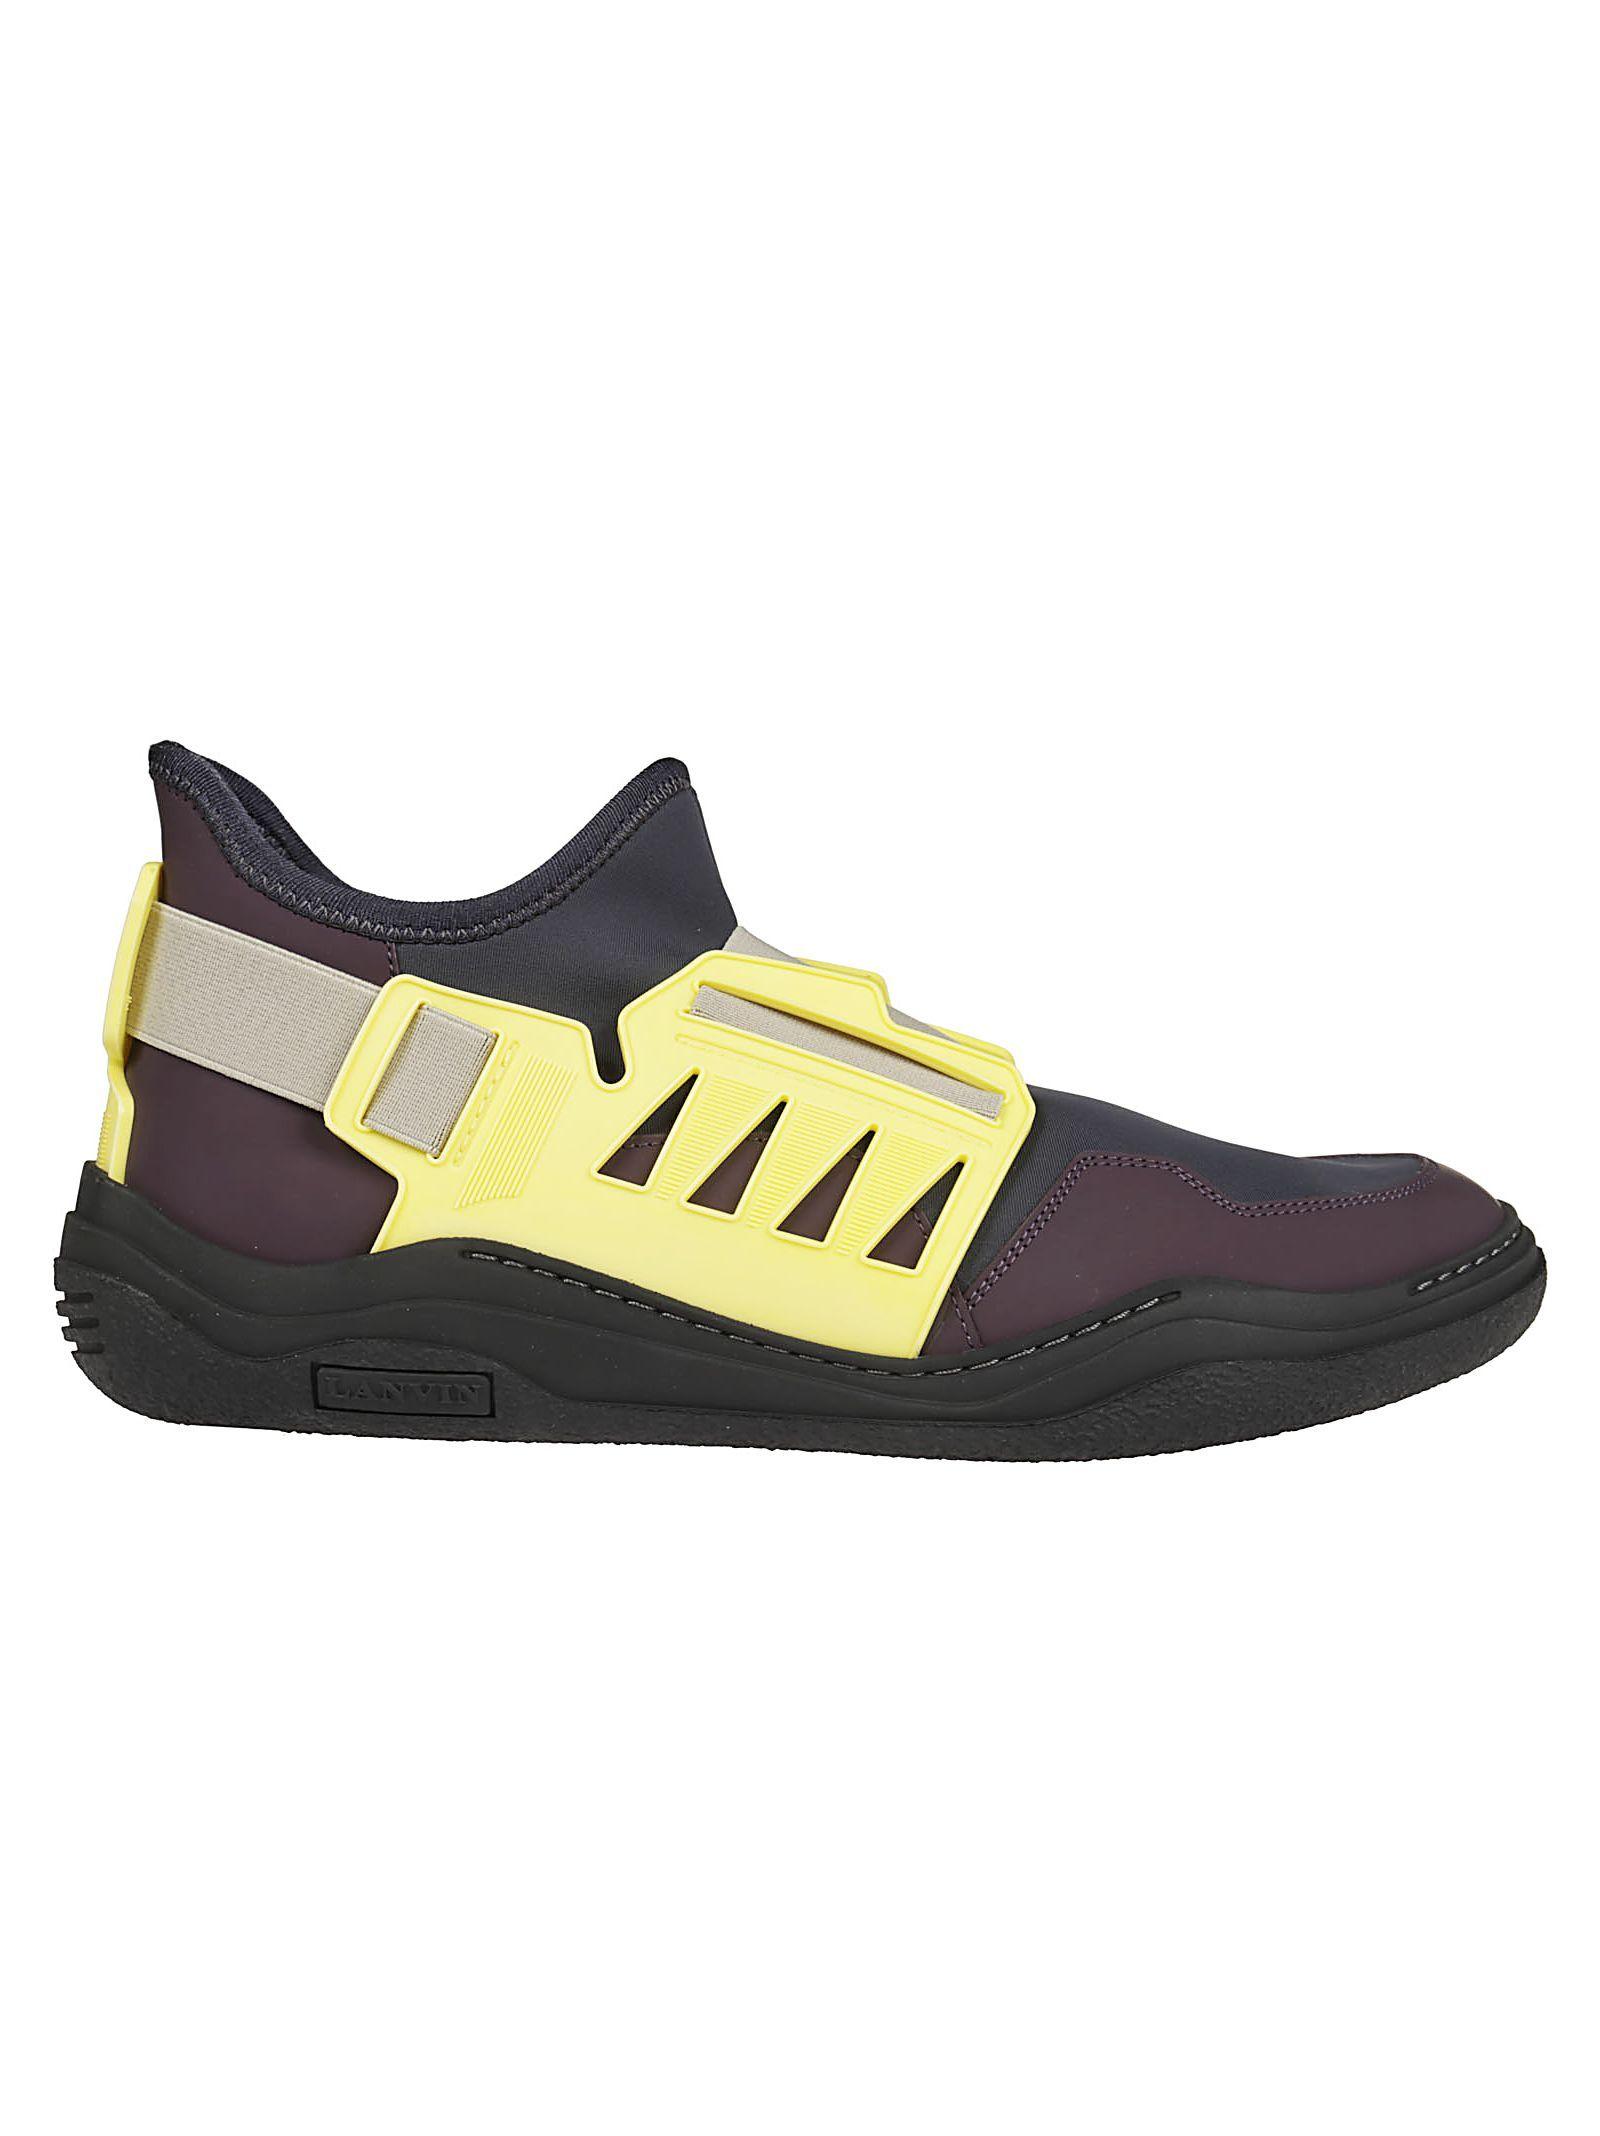 slip-on diving sneakers - Black Lanvin osoPz08Yx